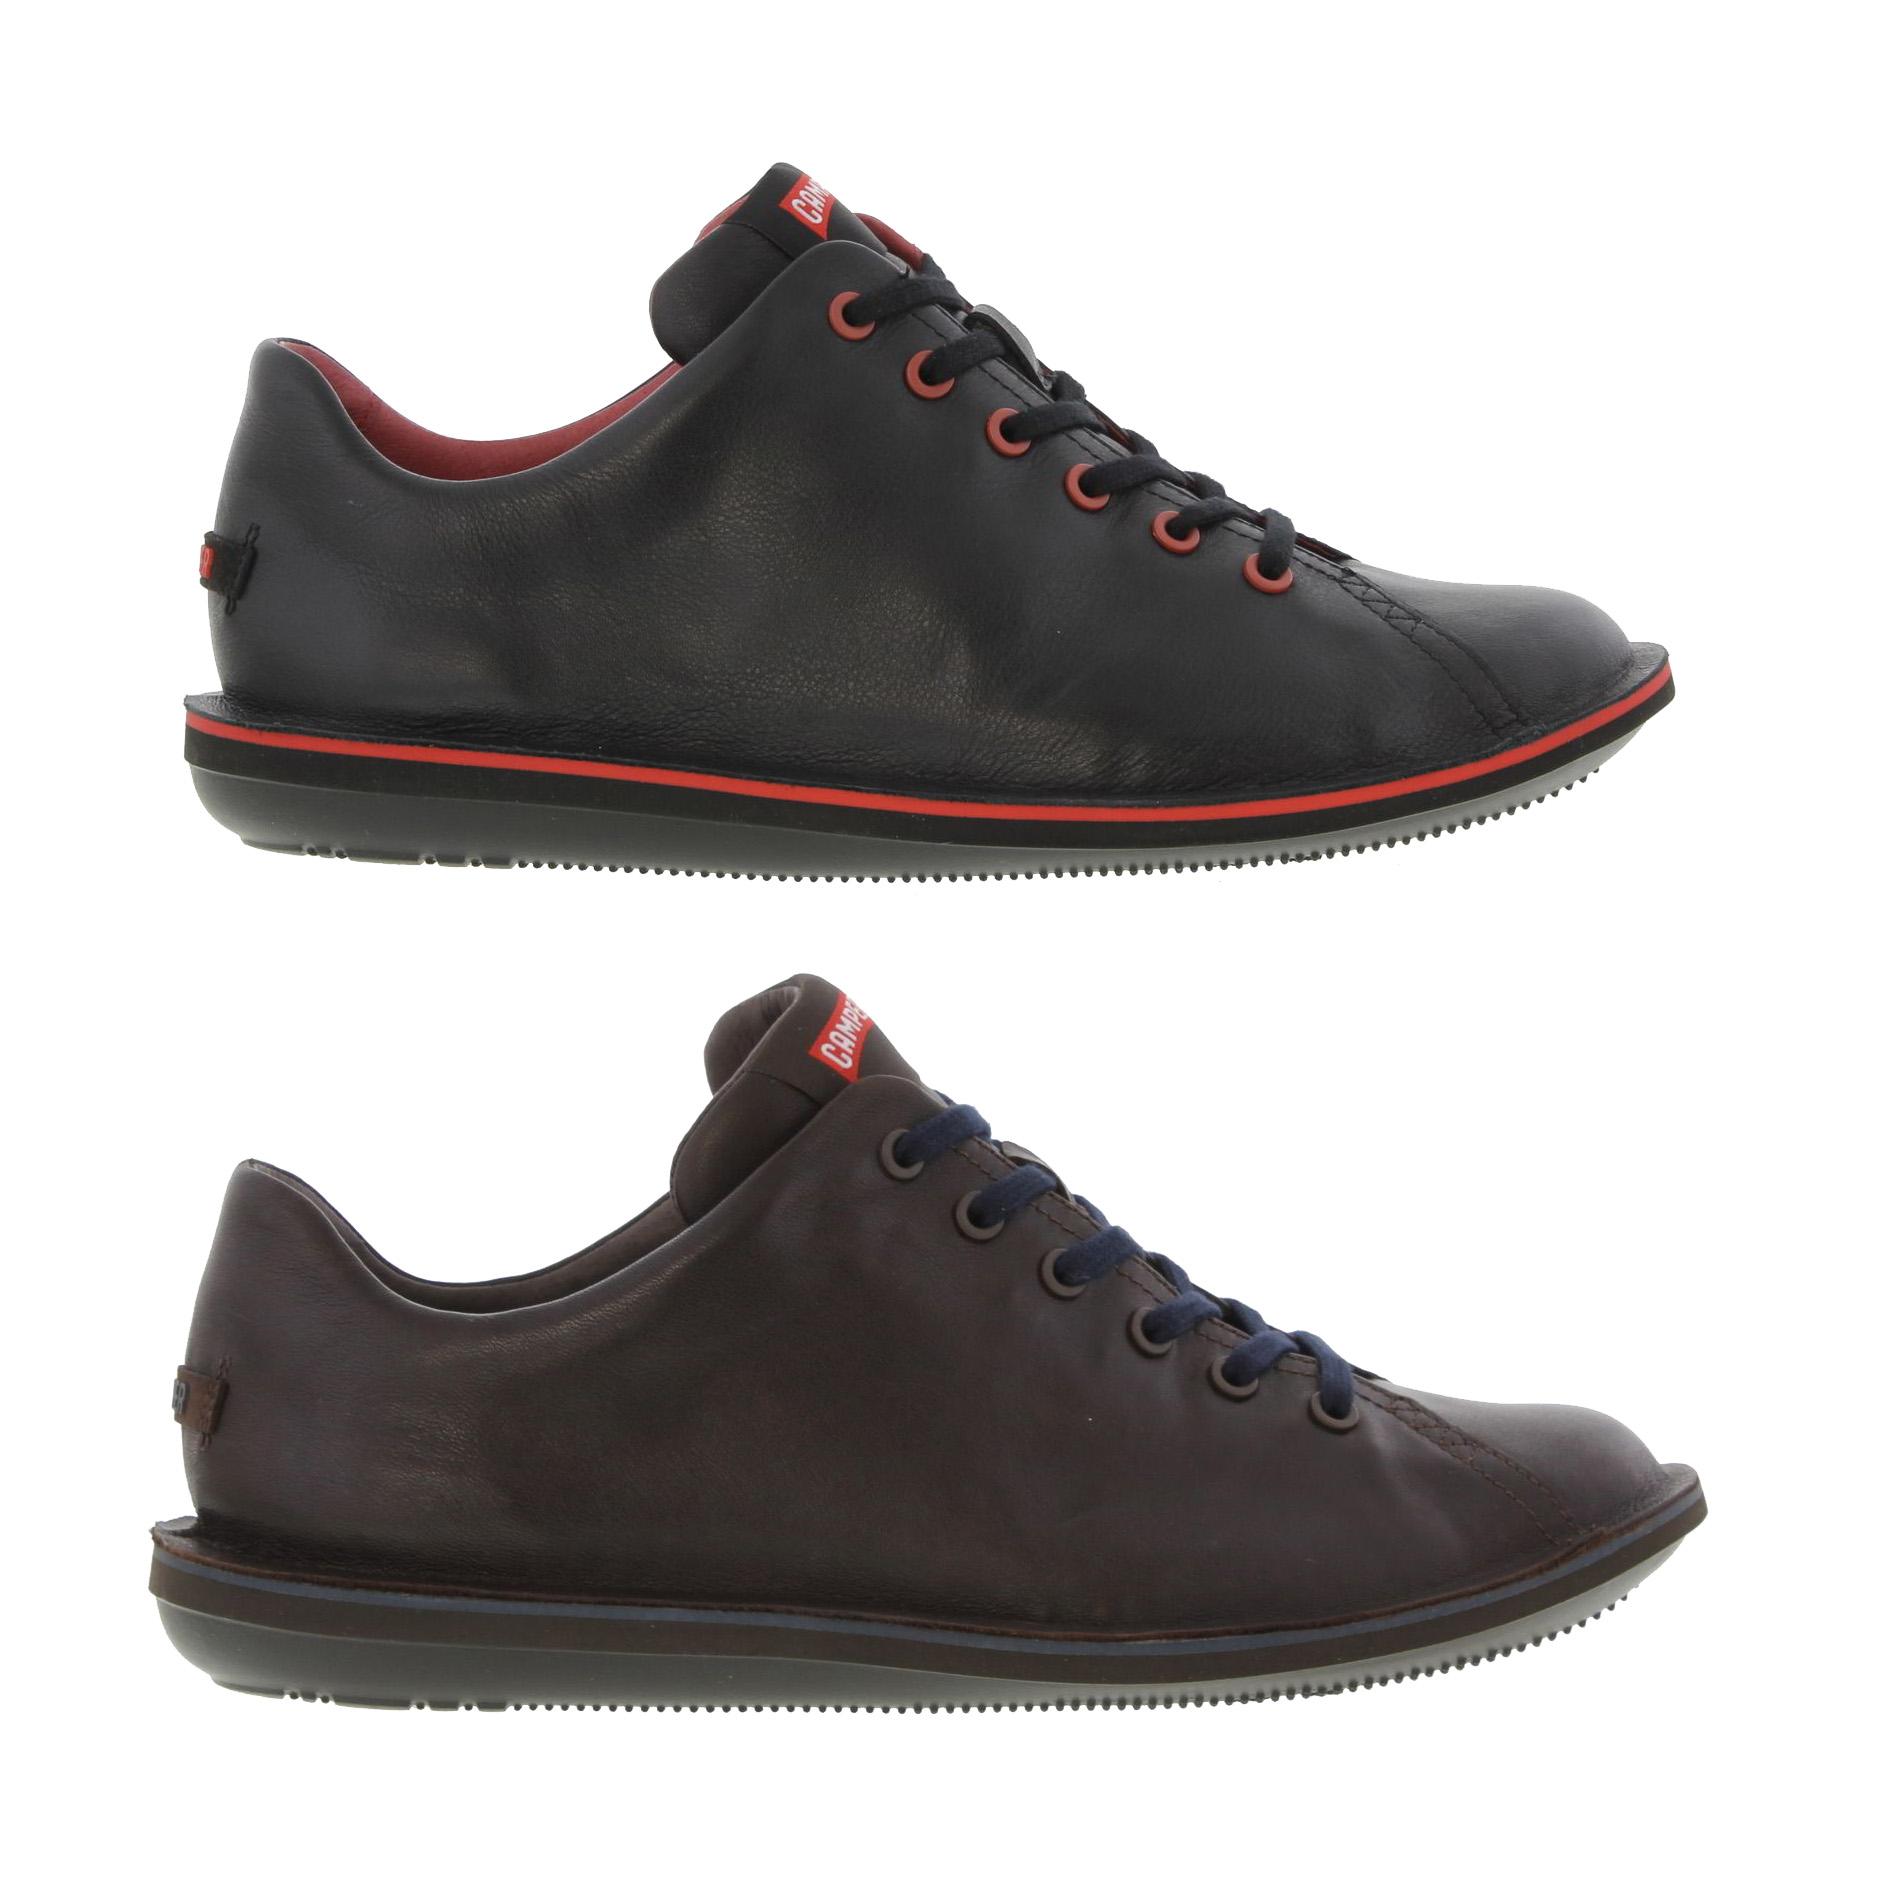 Bernie Mev Shoes Ebay Uk